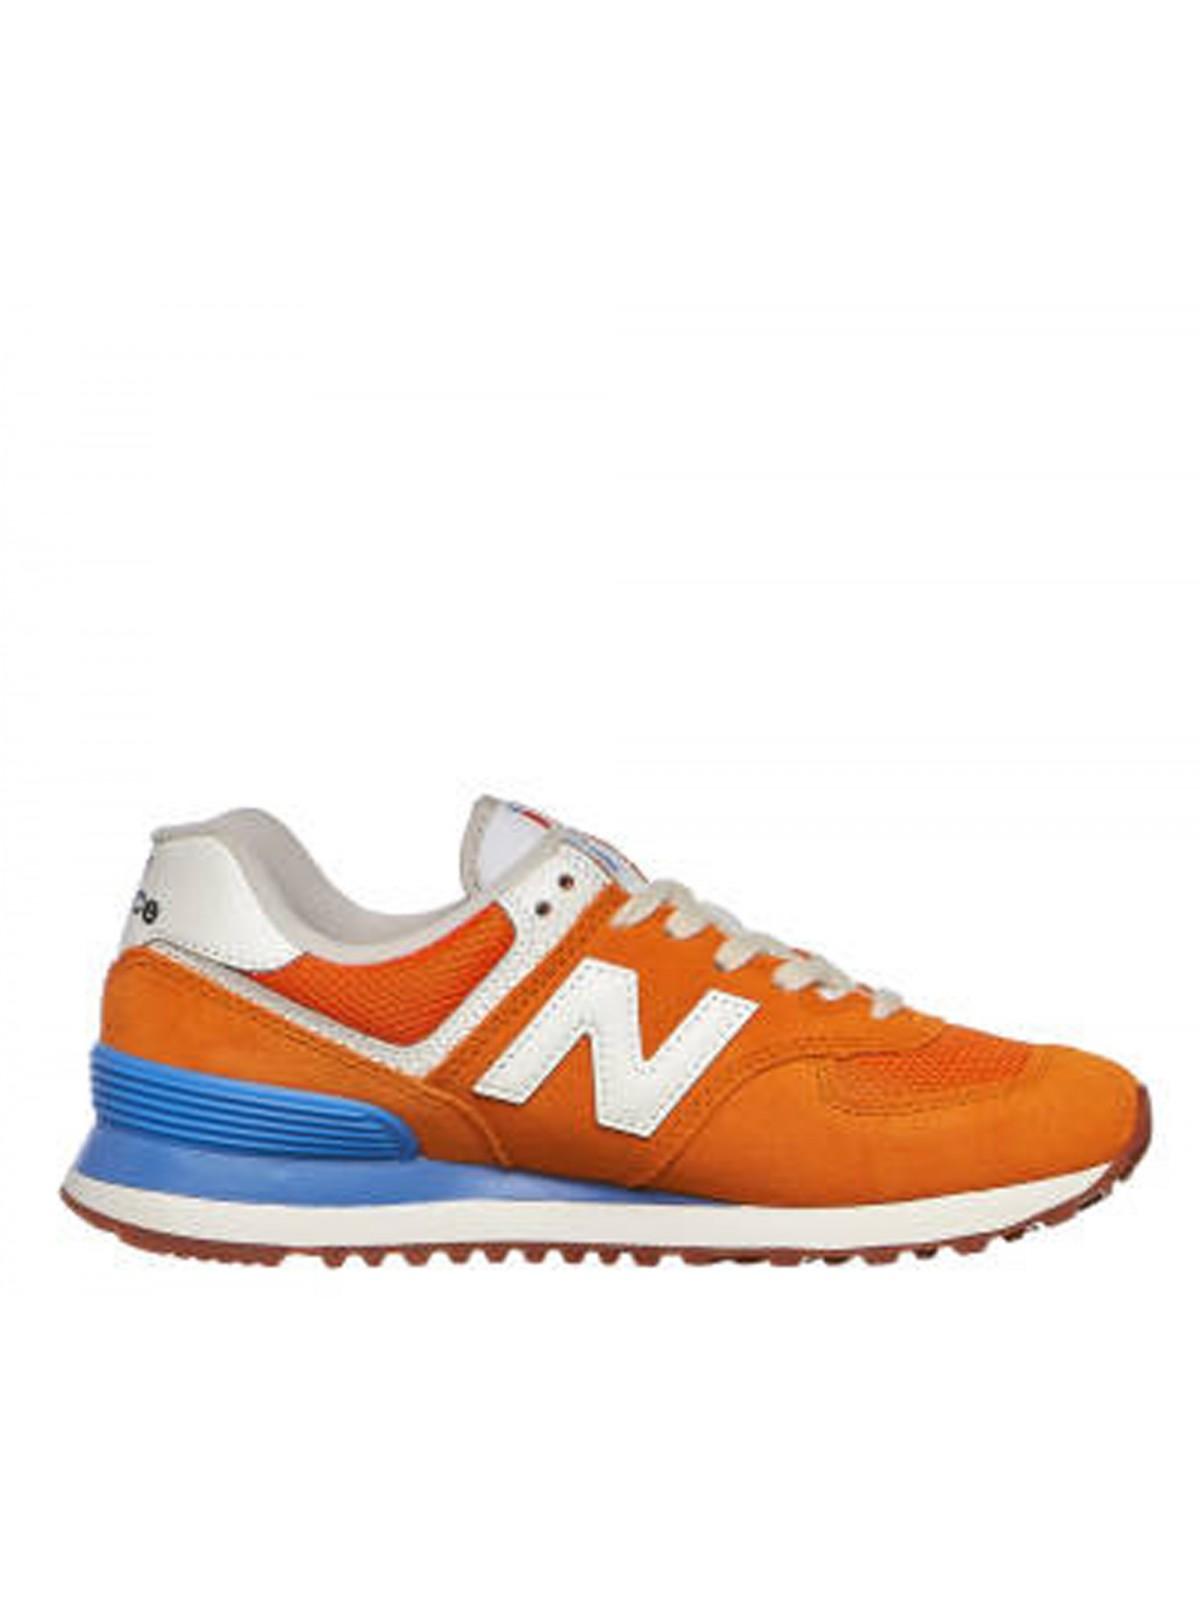 New Balance WL574 orange